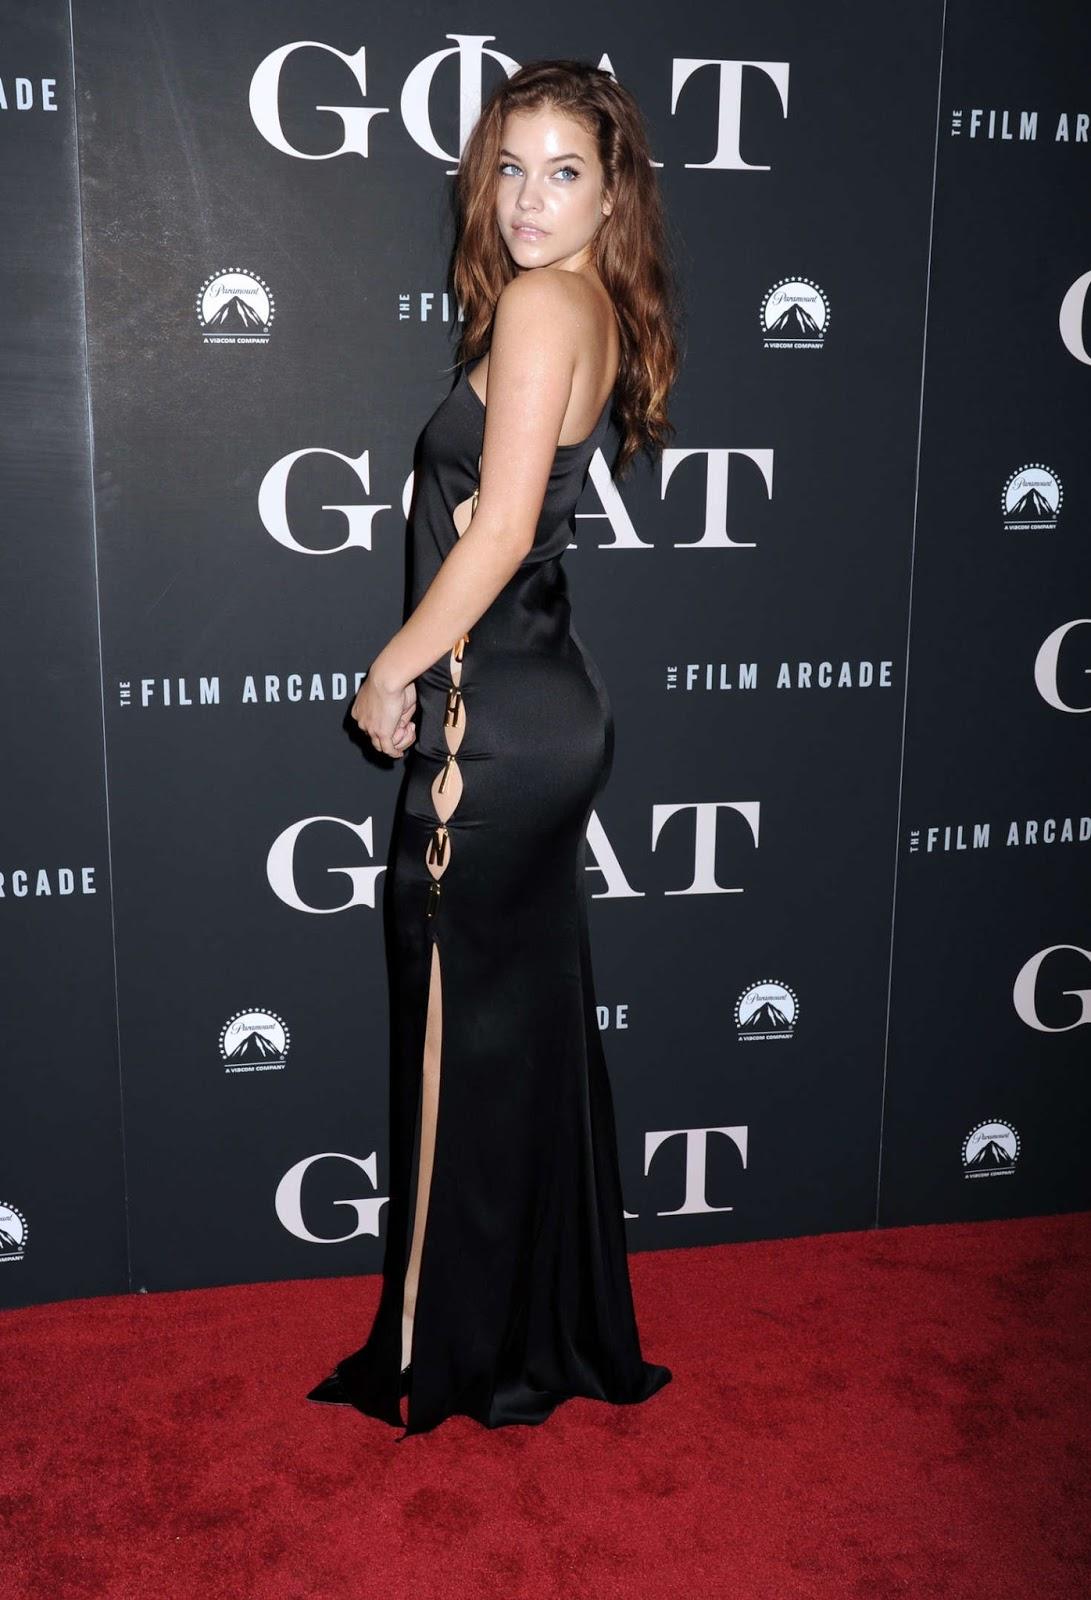 Barbara Palvin Posing at 'Goat' Premiere